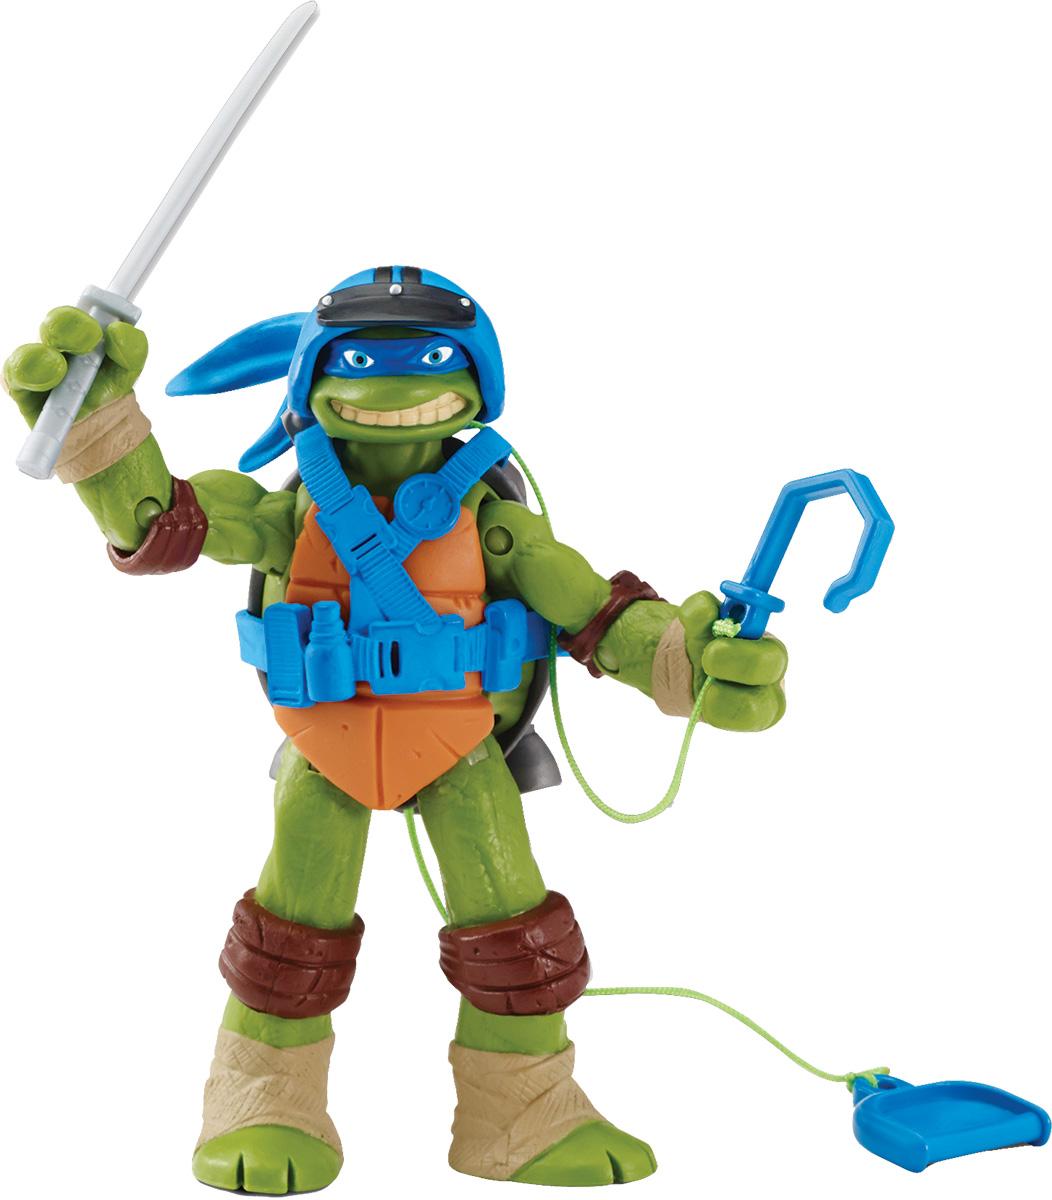 Черепашки Ниндзя Фигурка Леонардо-шпион игровые фигурки turtles машинка черепашки ниндзя 7 см сплинтер на атаке сенсея